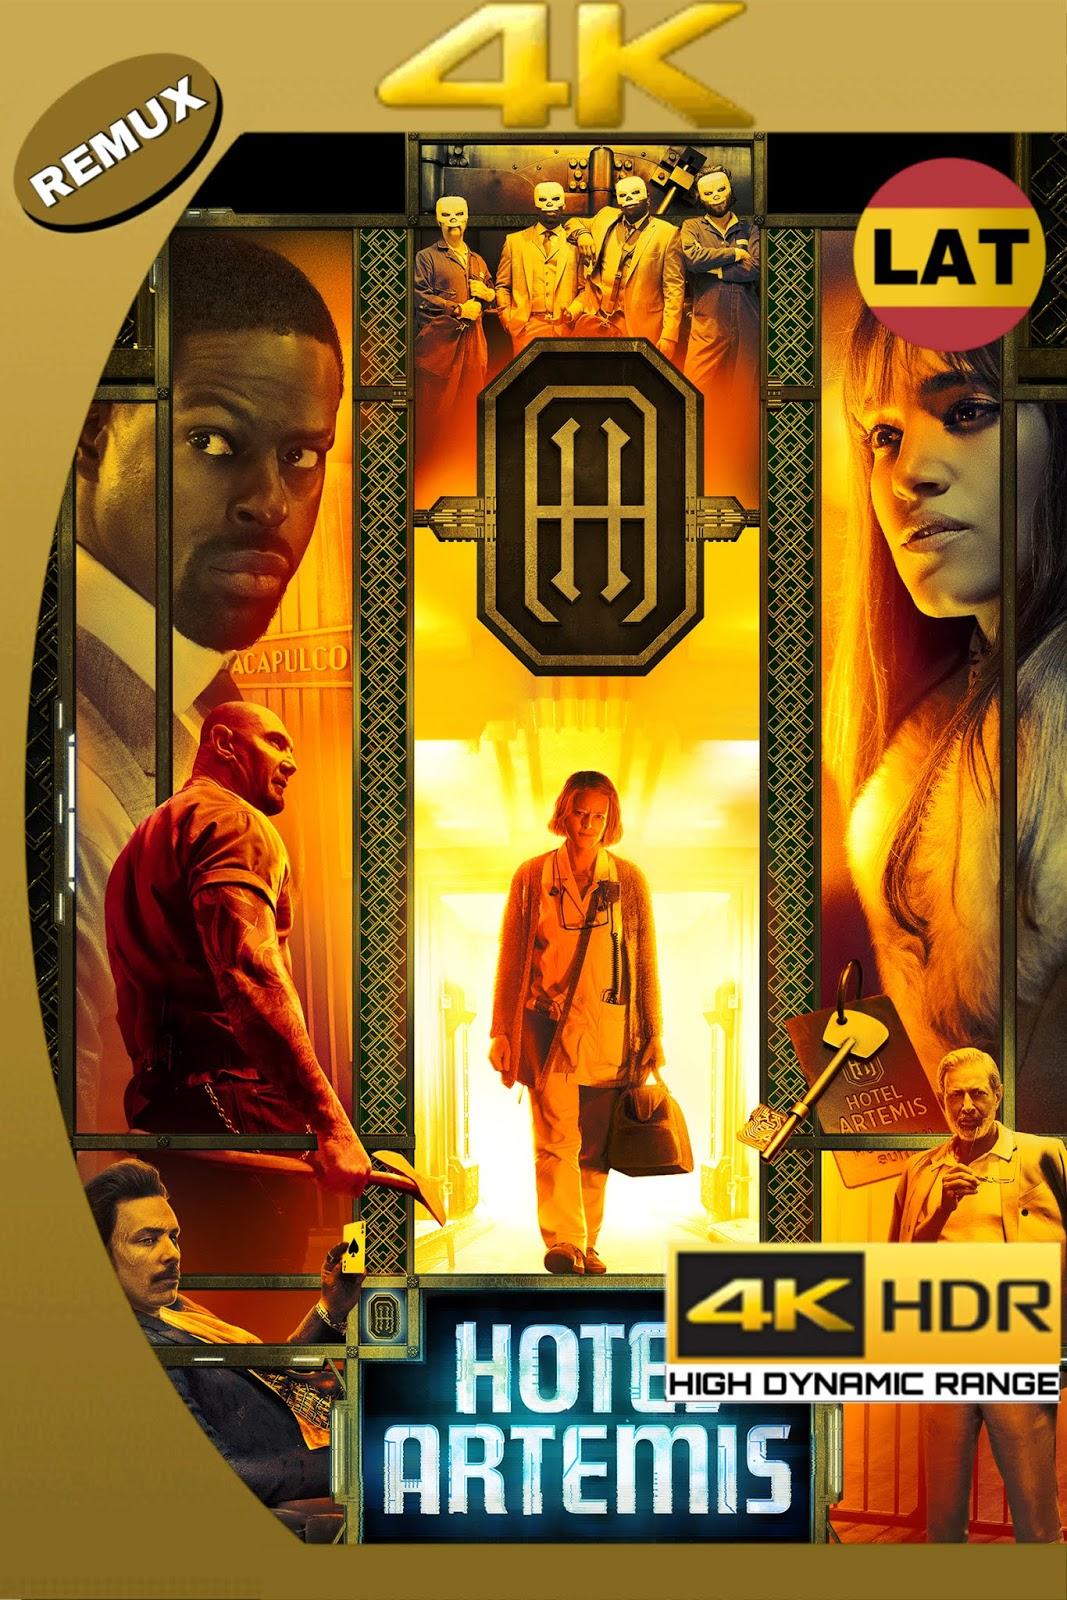 HOTEL ARTEMIS 2018 LAT-ING ULTRA HD 4K HDR BDREMUX 2160P 50GB.mkv